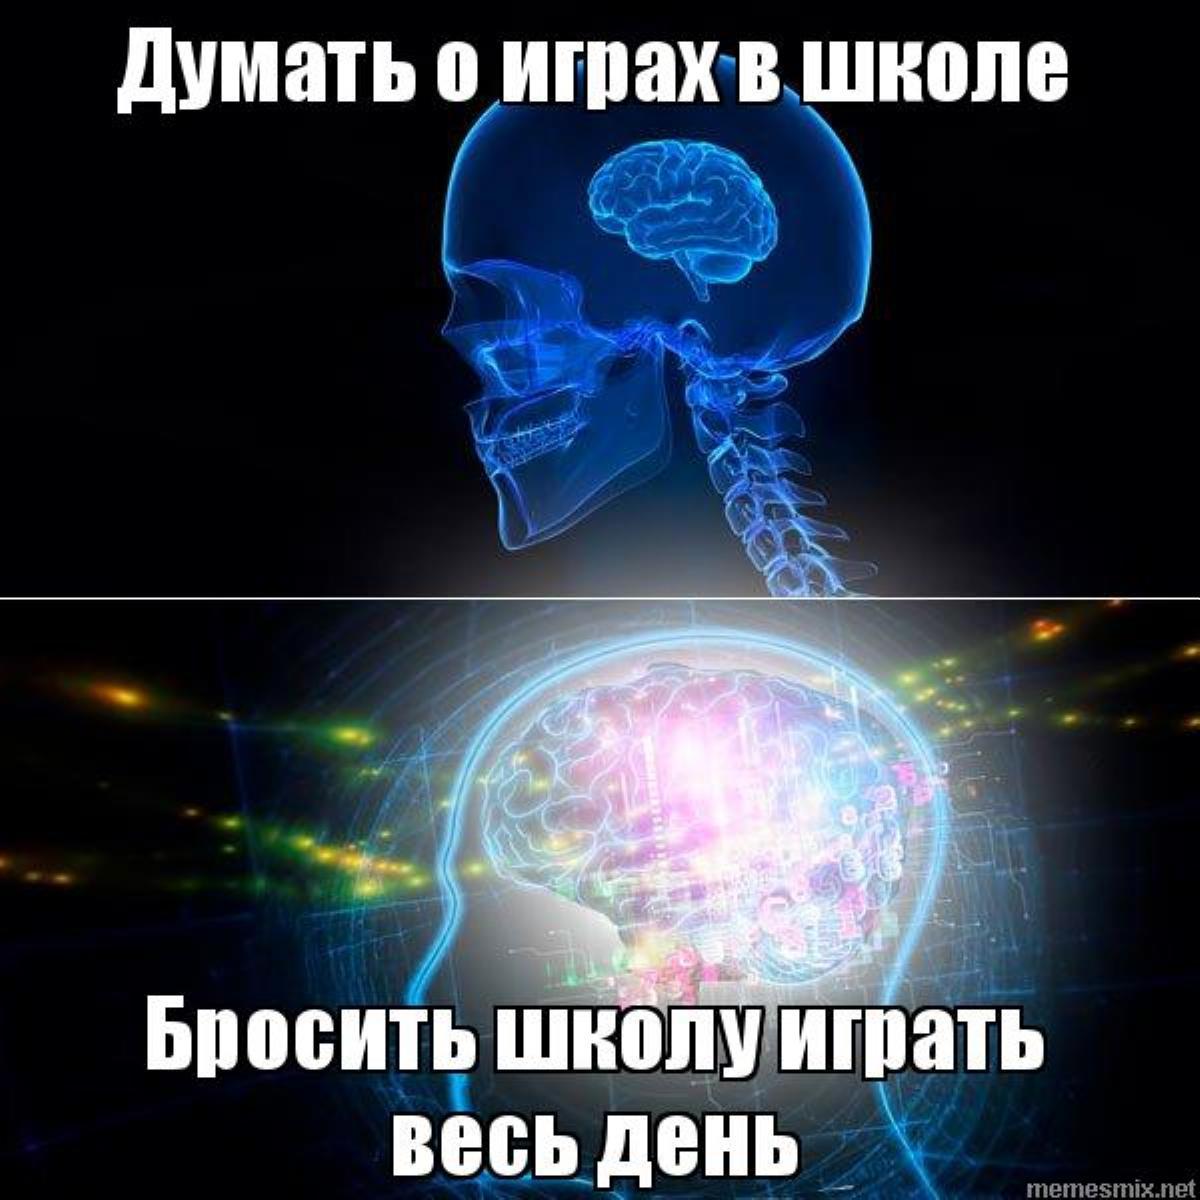 pate1k, Патрик Захарченко, про игрок League of Legends, Лига Легенд, League of Legends